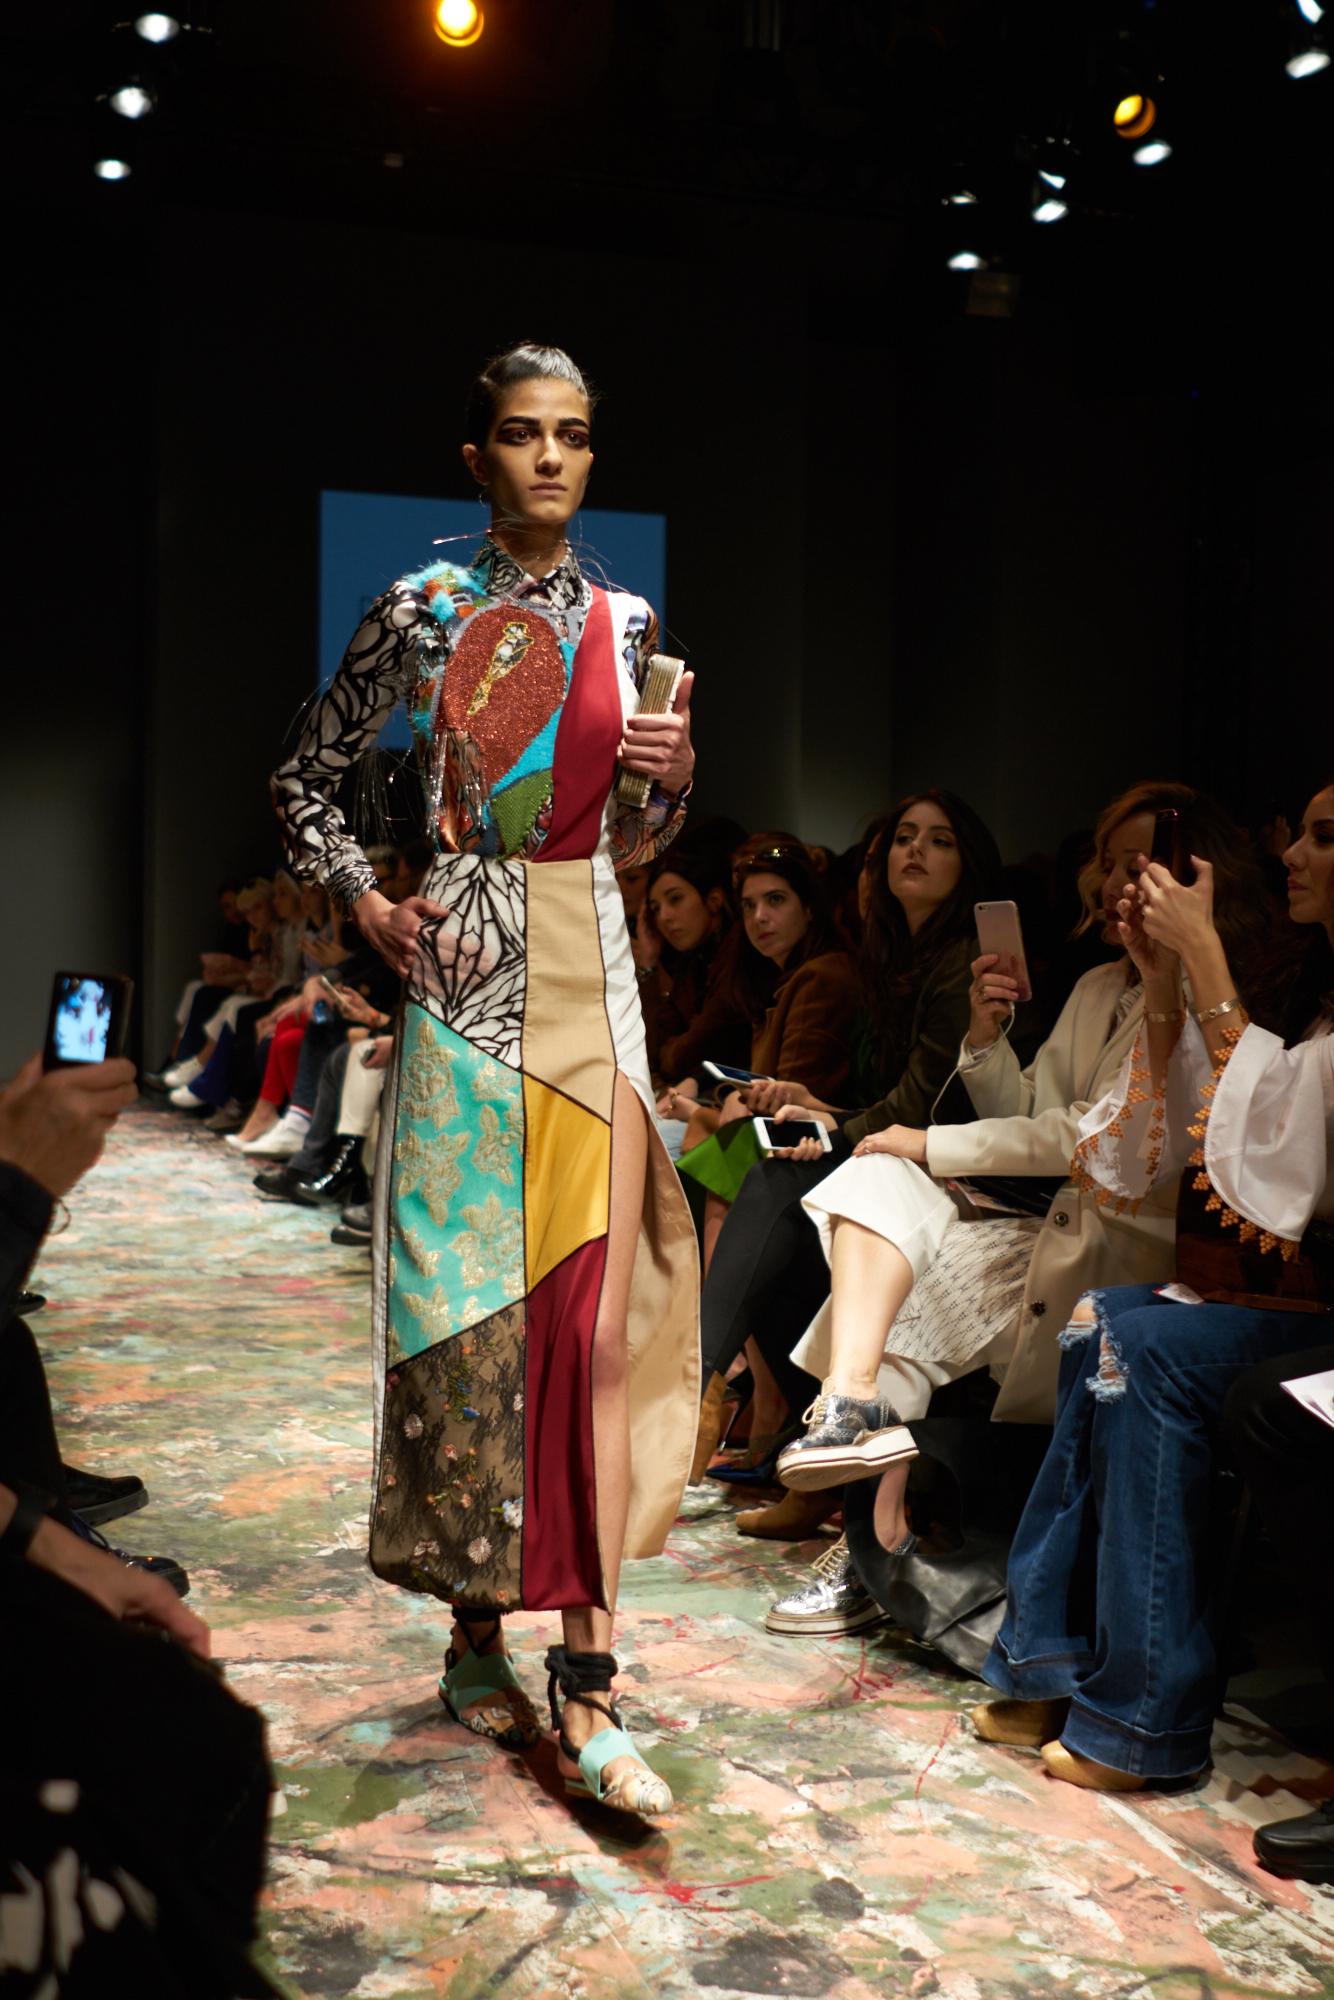 billur saatci, street style, mbfwi, off ne giysem, turkish style blogger, mercedes benz fashion week istanbul, bashaques,